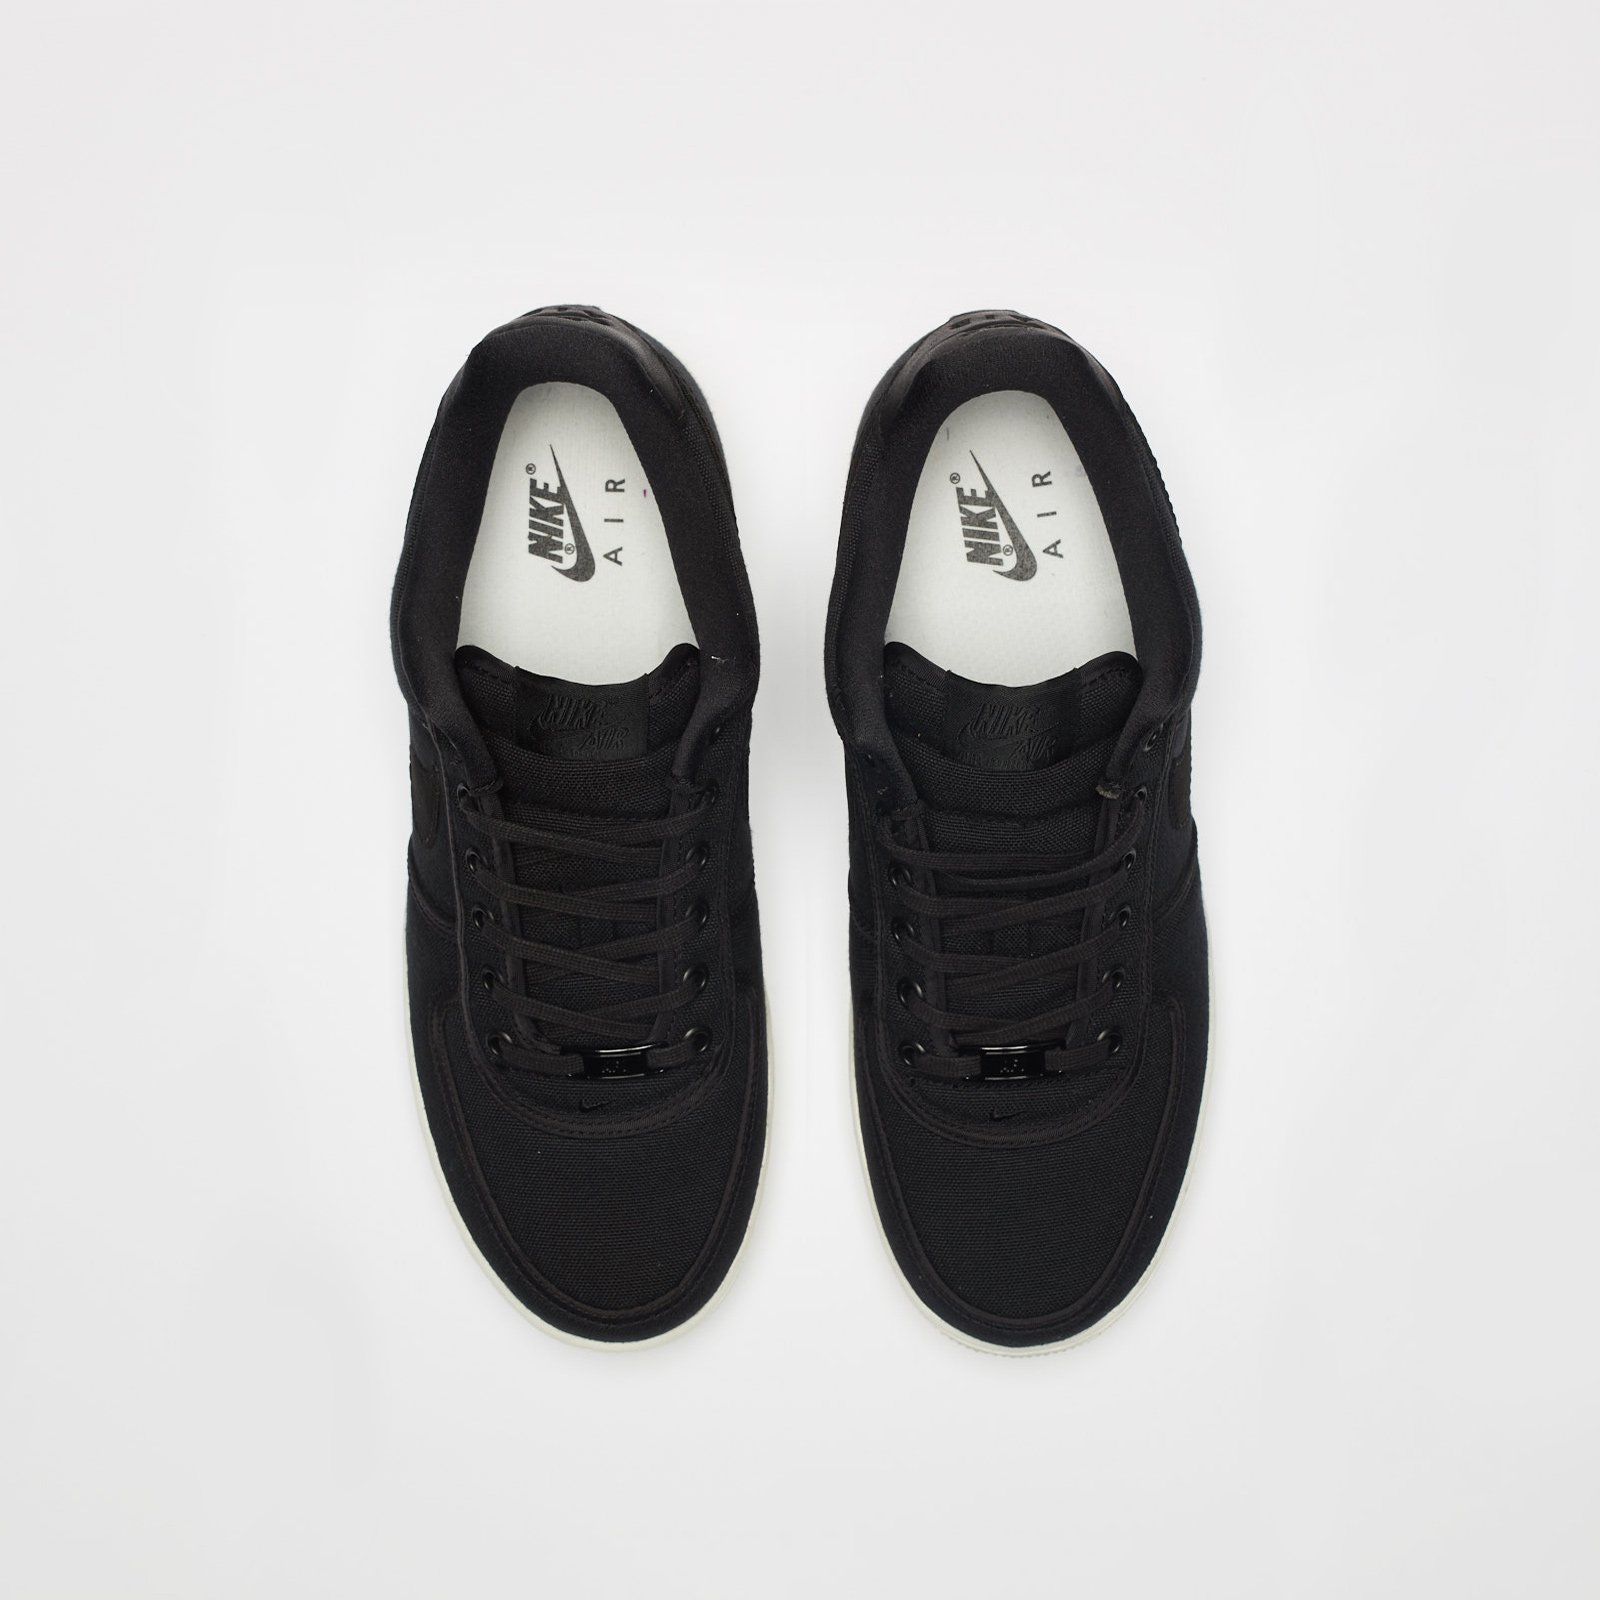 566a18daabe Nike Air Force 1 Low Retro QS Cnvs - Ah1067-004 - Sneakersnstuff ...